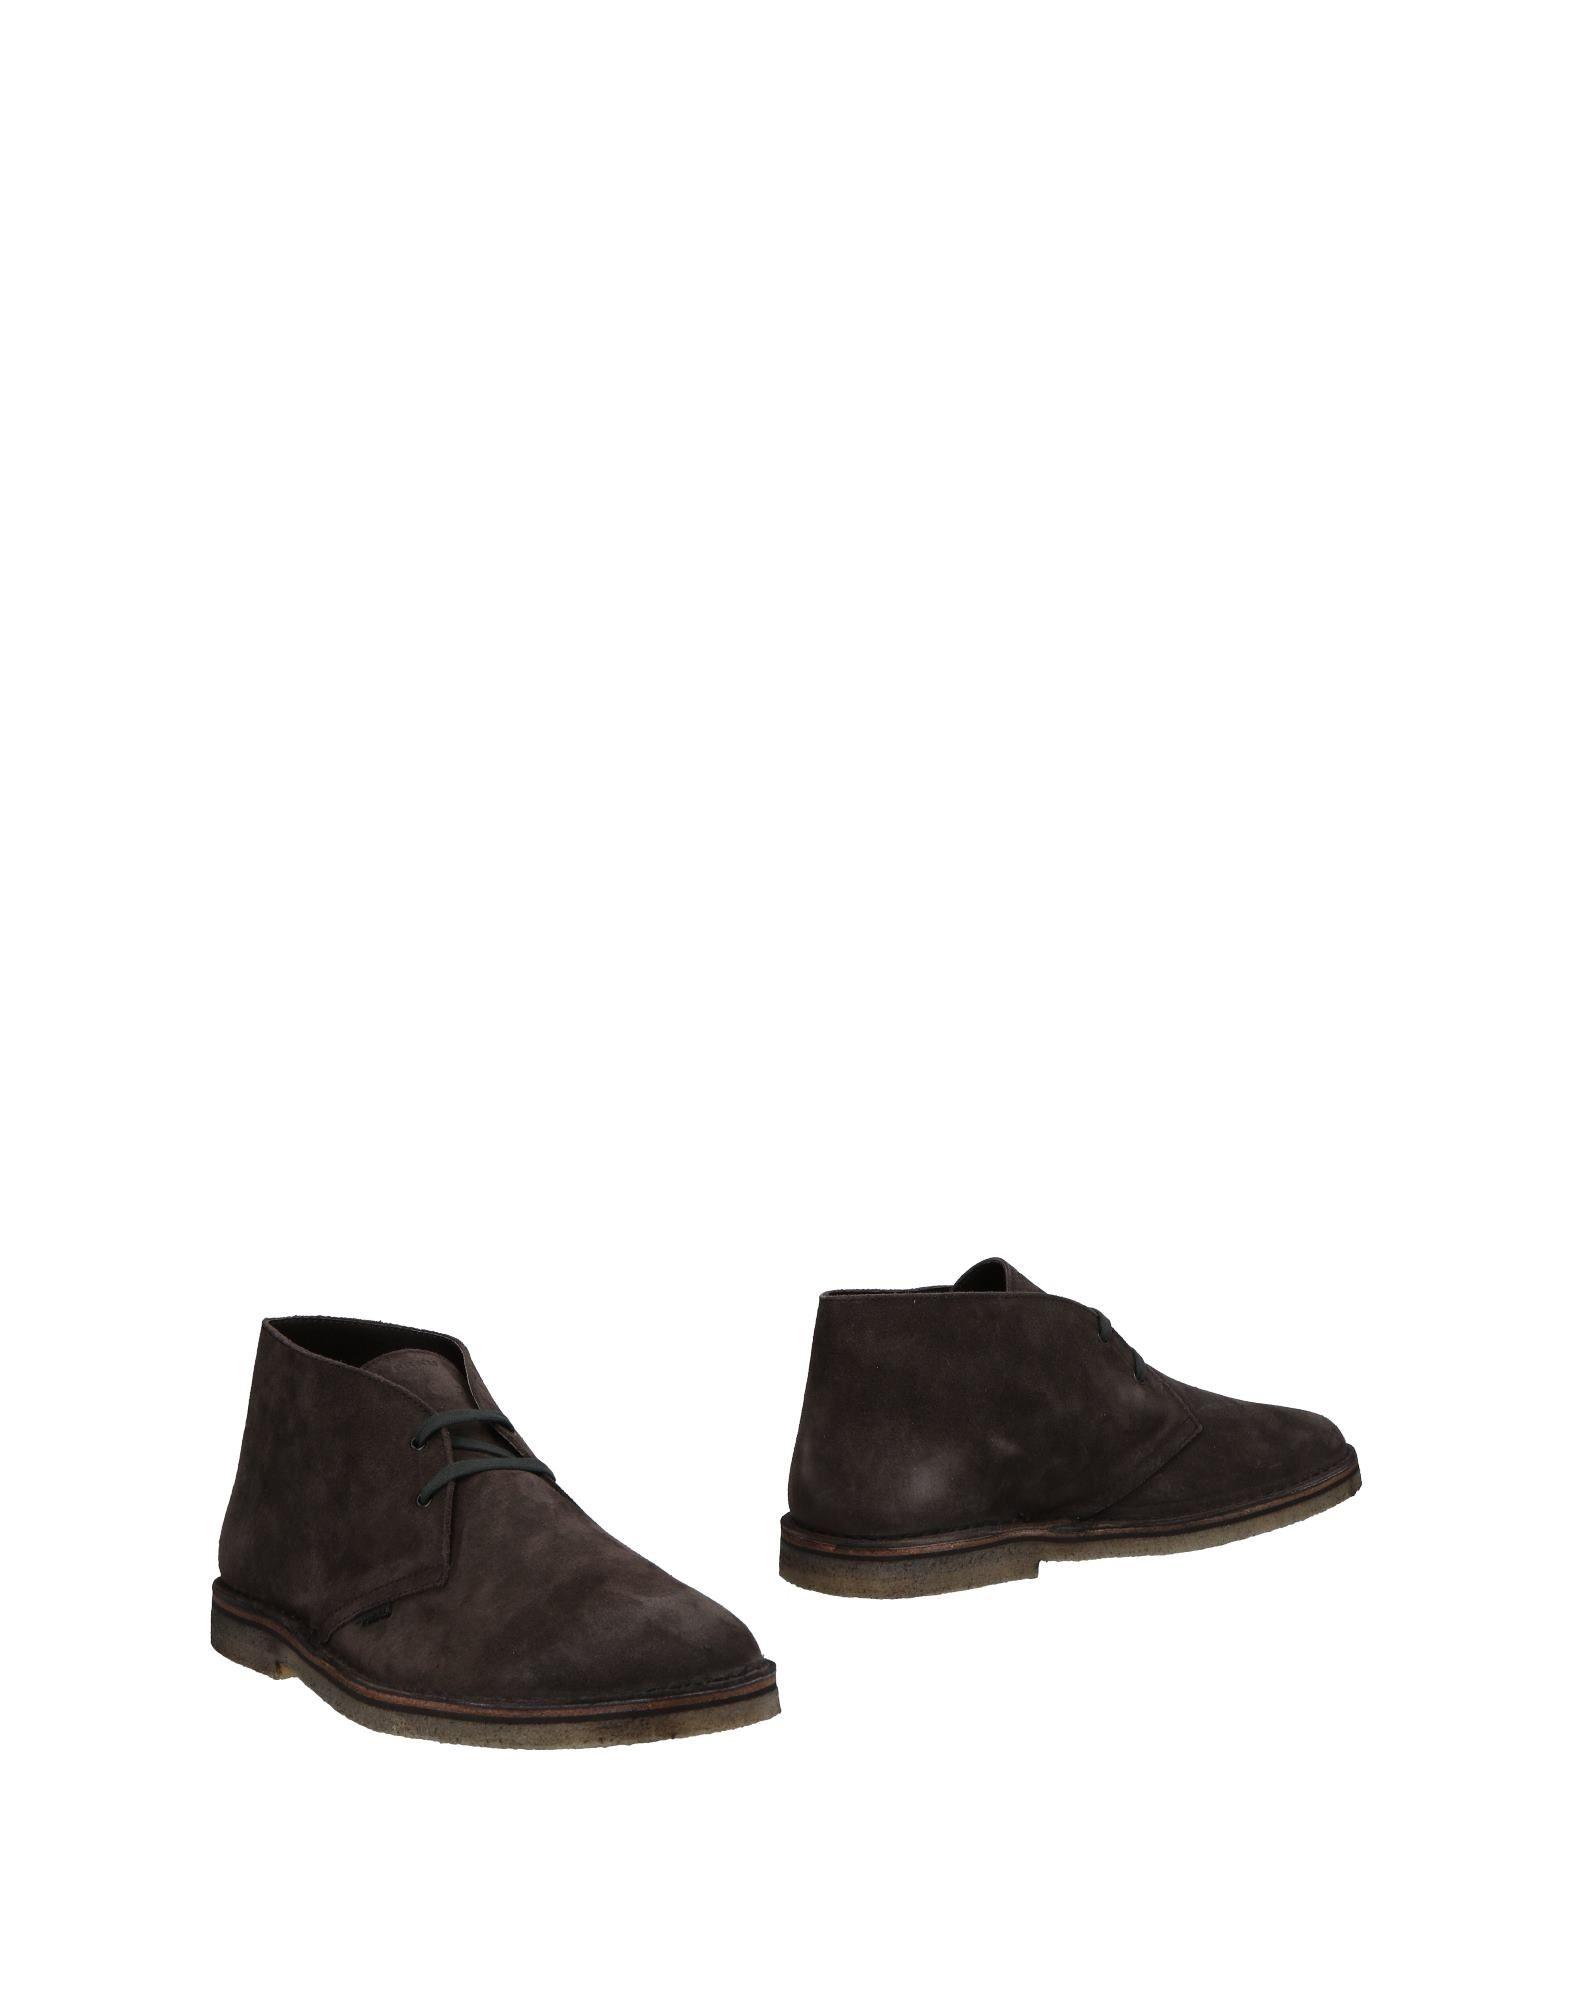 Rabatt echte Schuhe Frau Stiefelette Herren  11316511QI